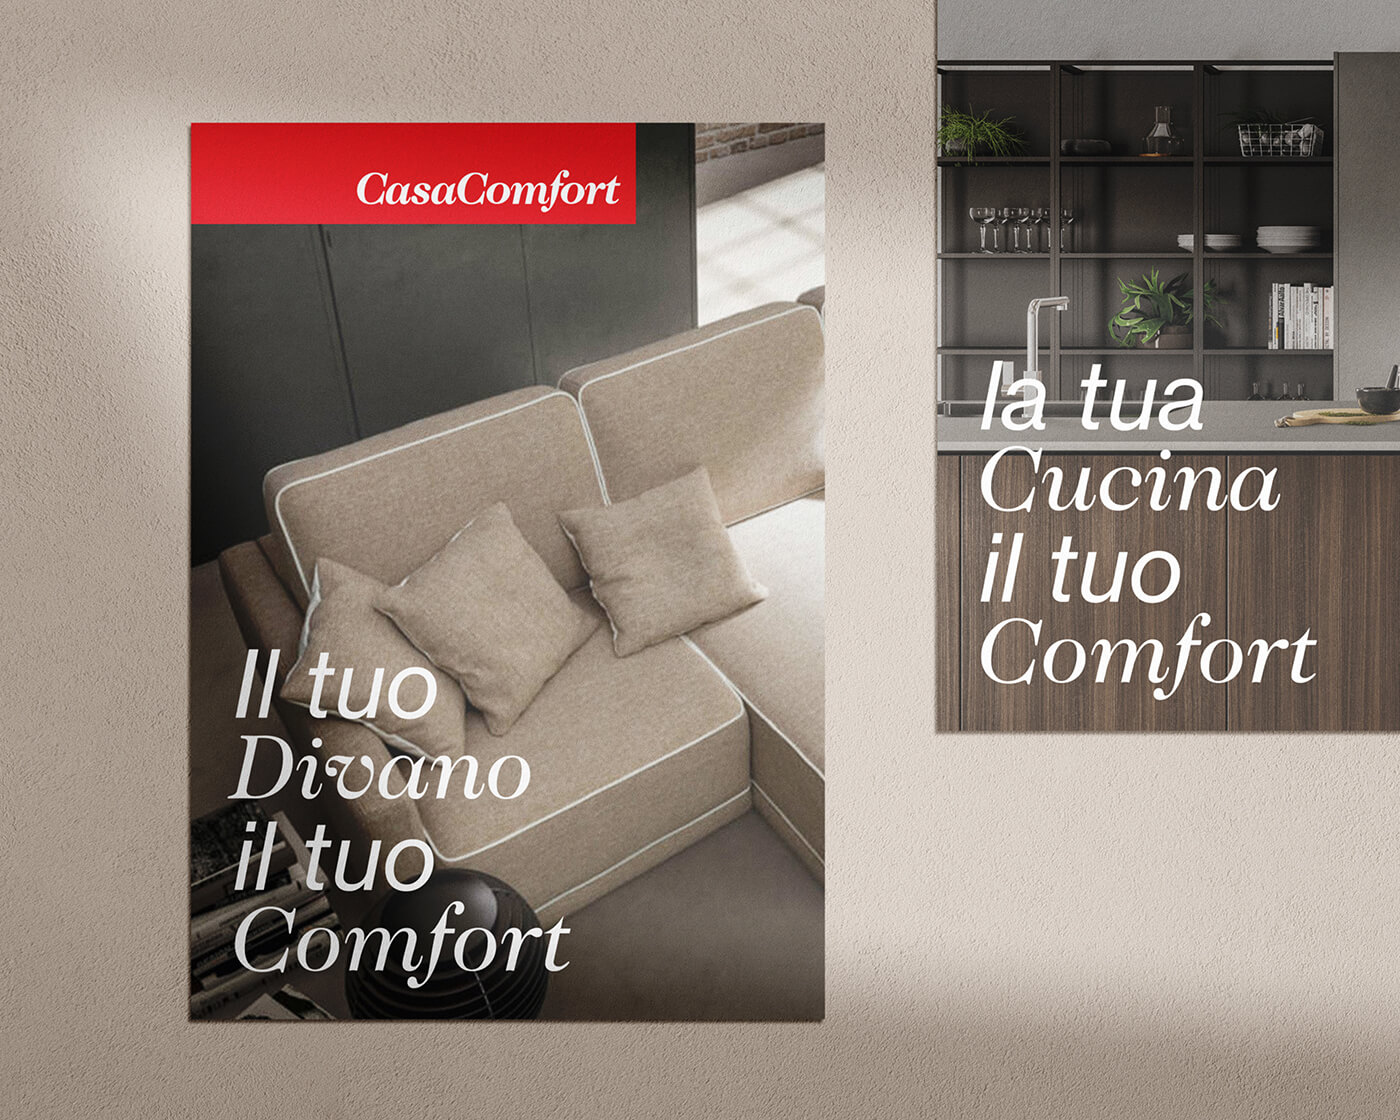 Casa Comfort - Posters